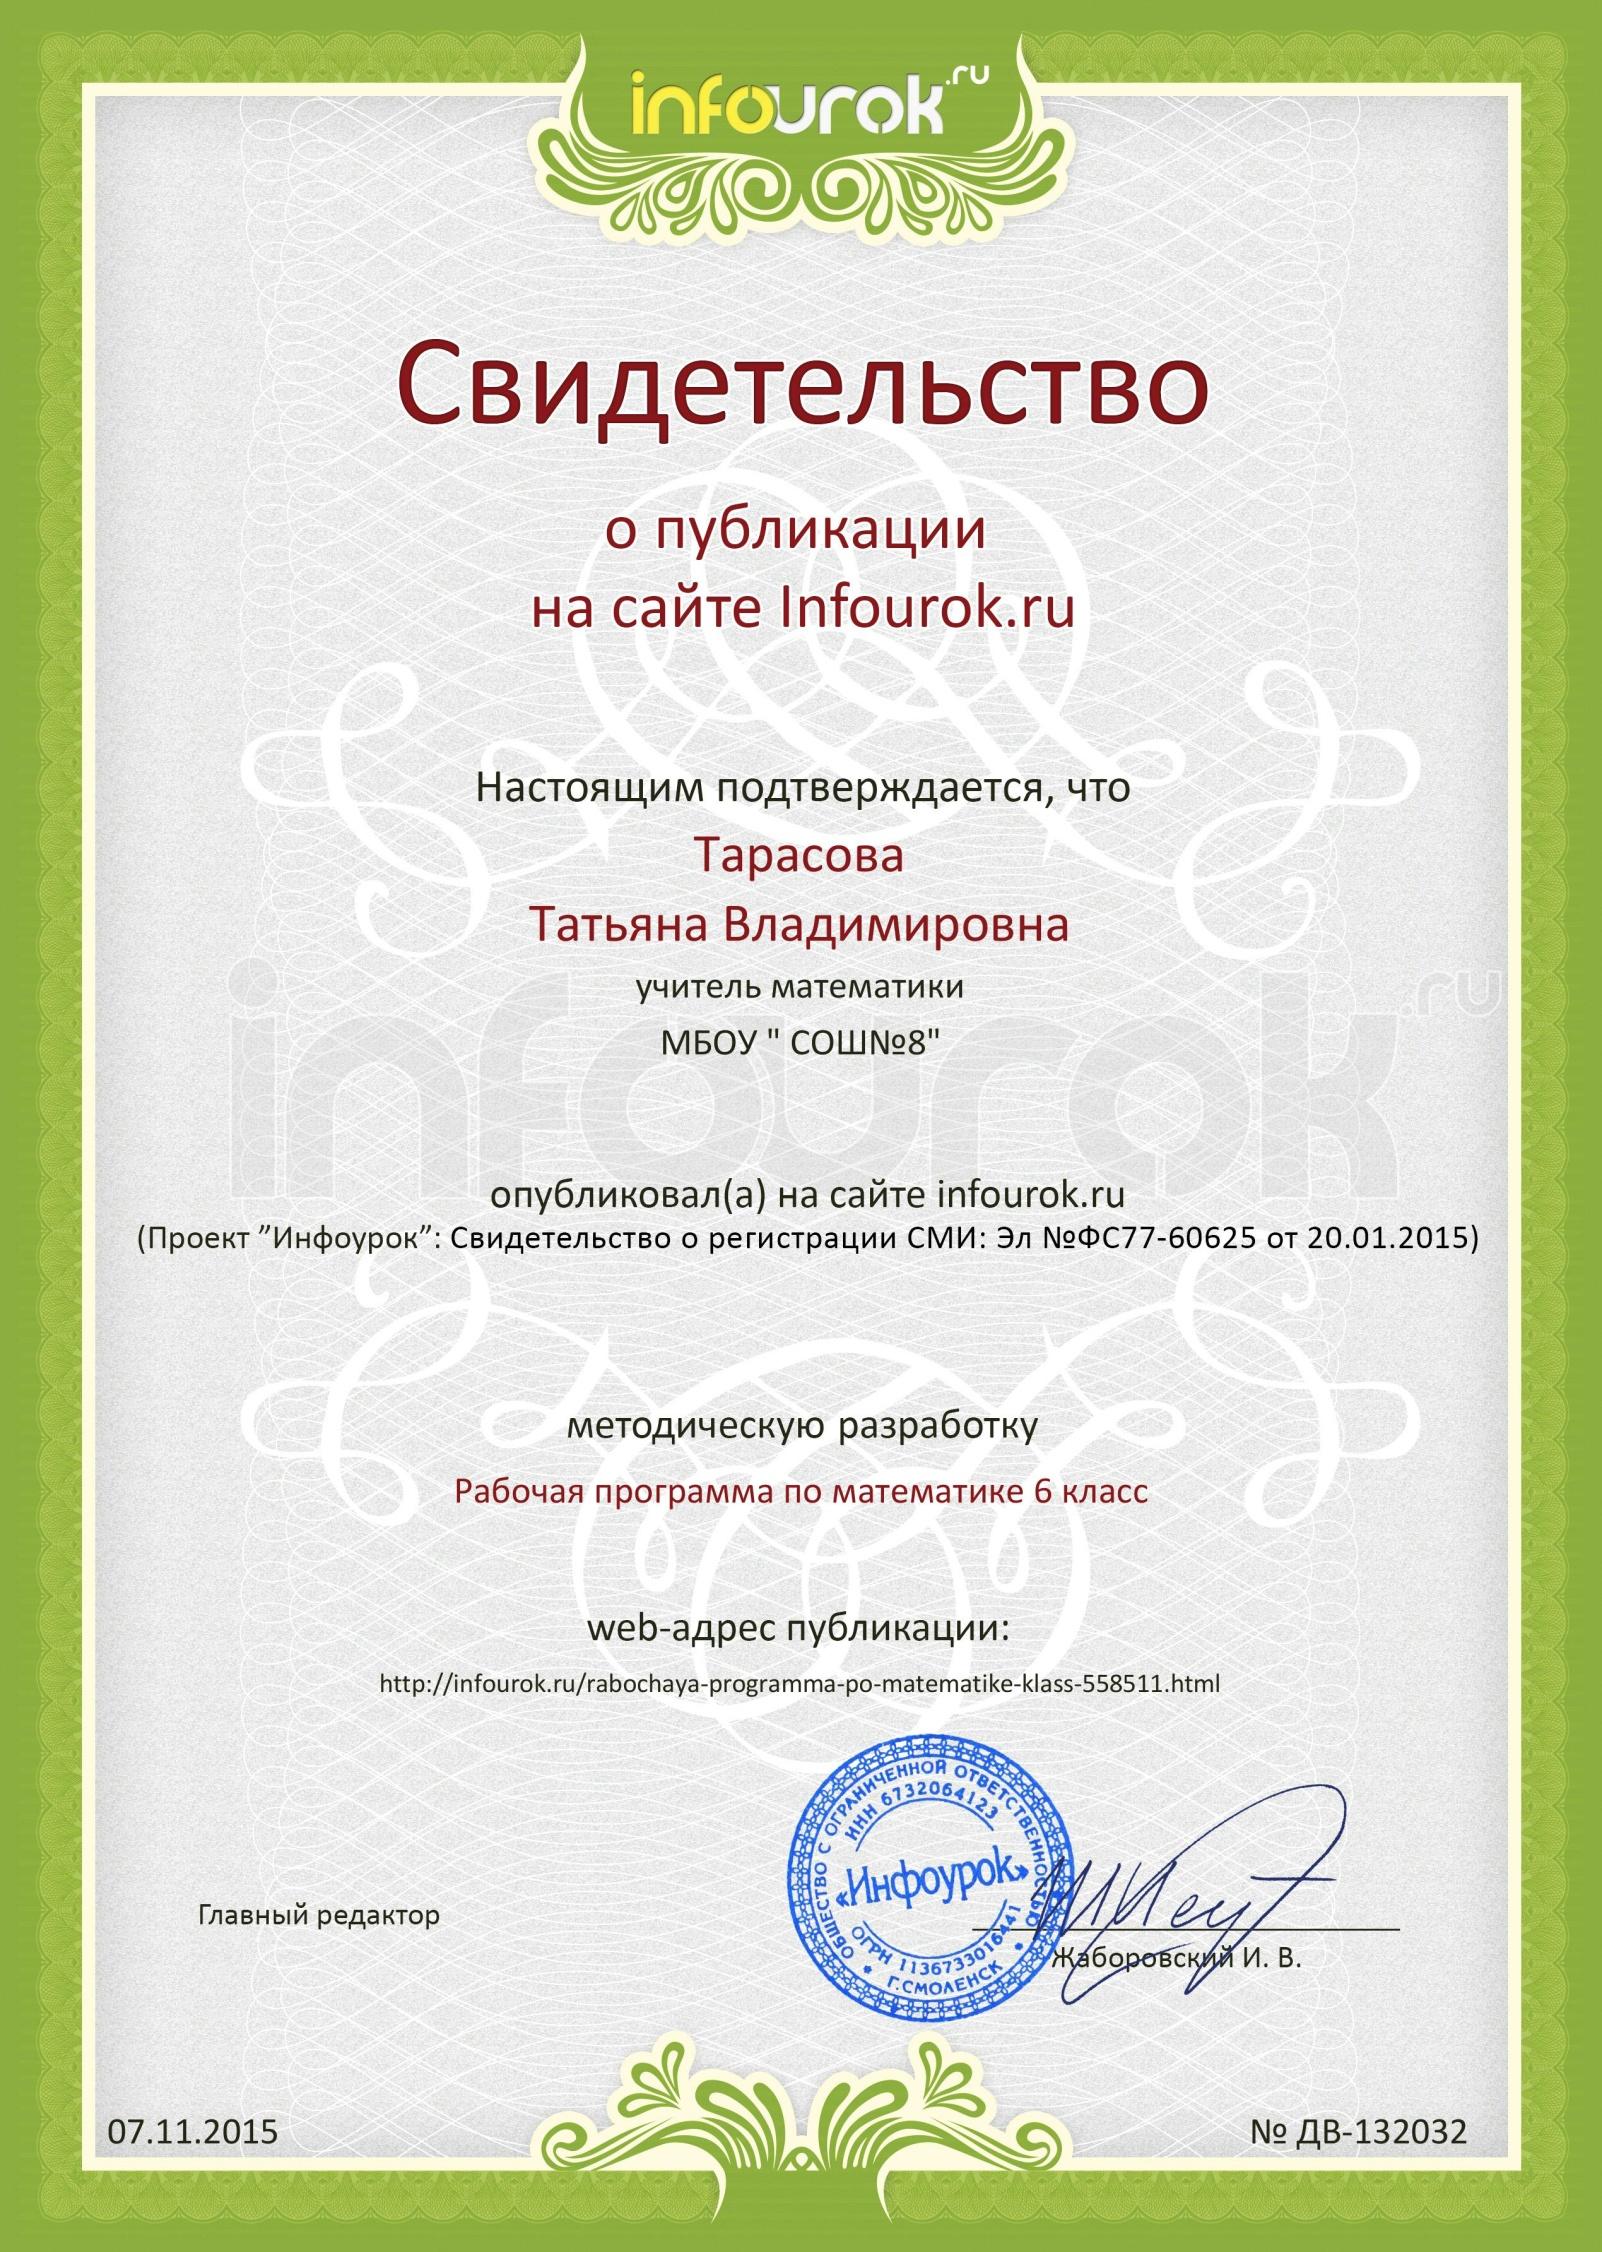 C:\Users\User\Downloads\Сертификат проекта infourok.ru № ДВ-132032.jpg